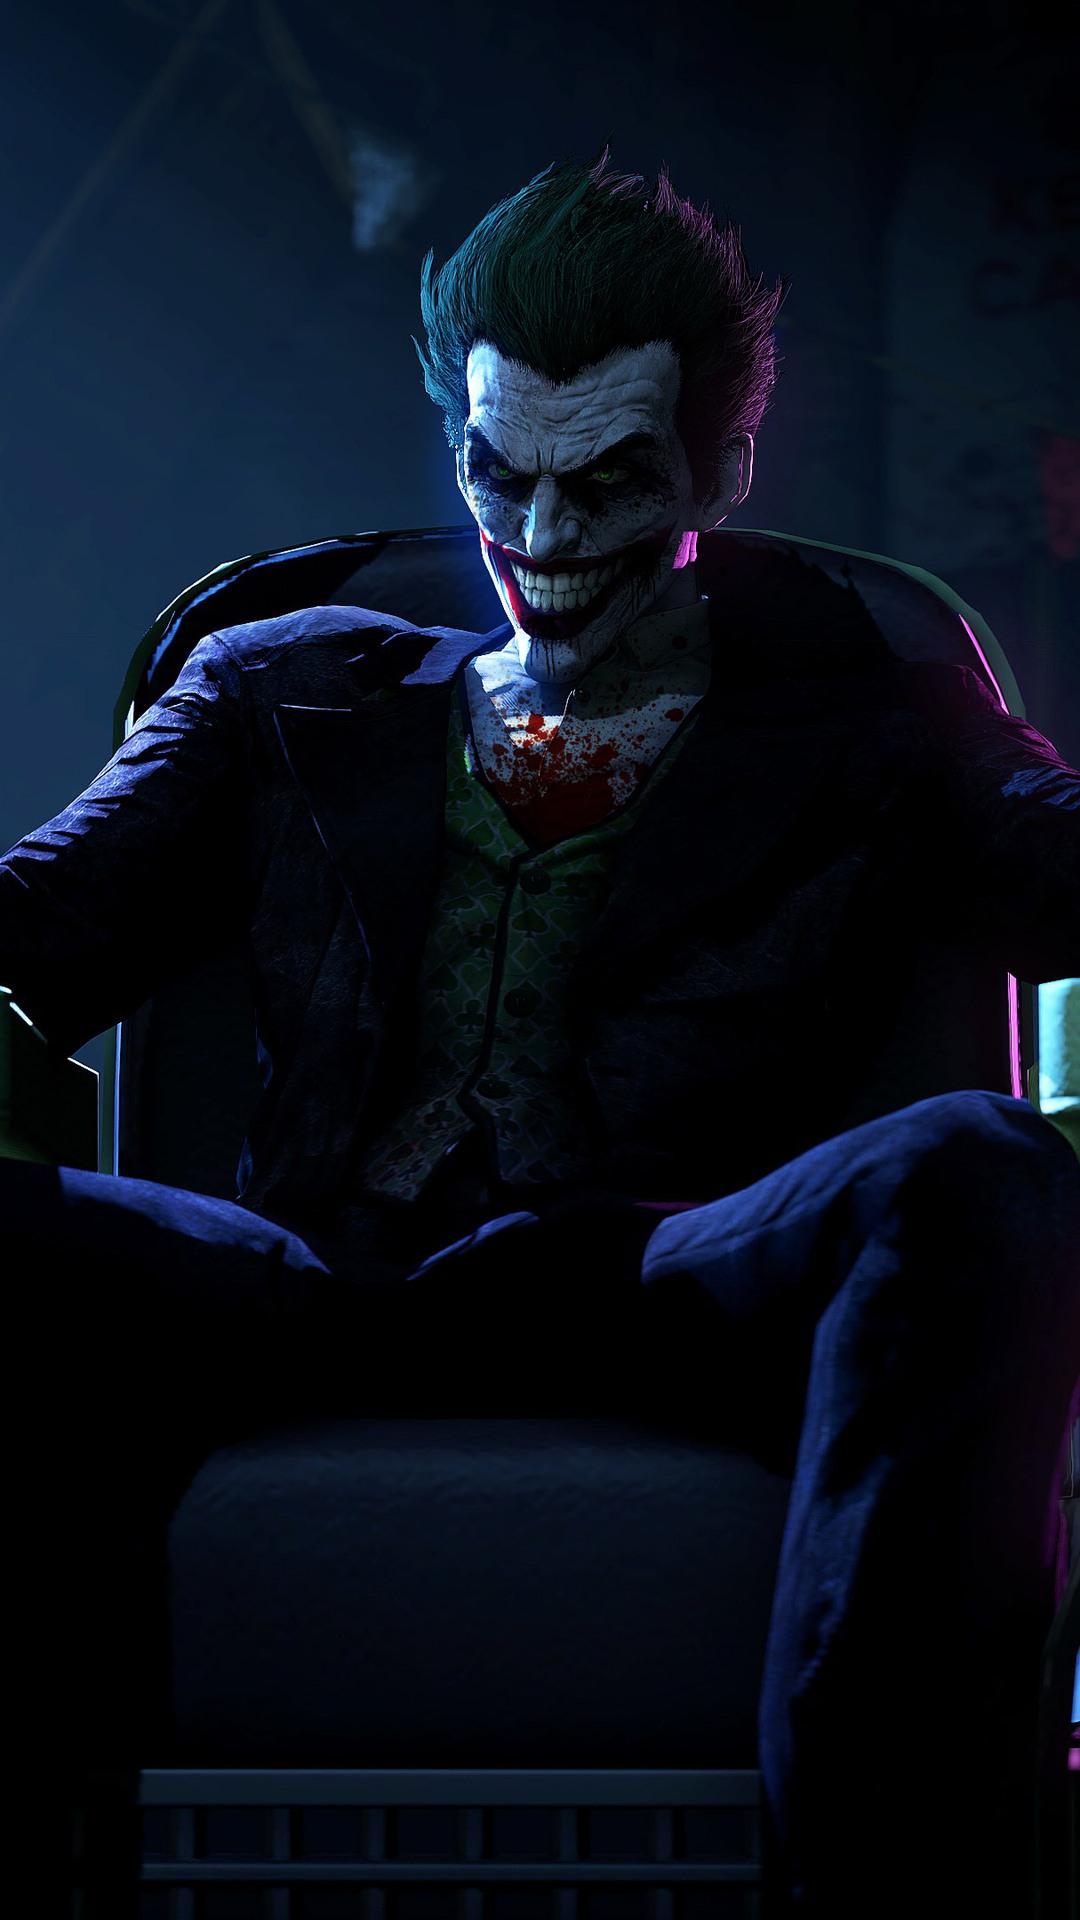 1080x1920 Joker In Batman Arkham Origins Iphone 7,6s,6 ...